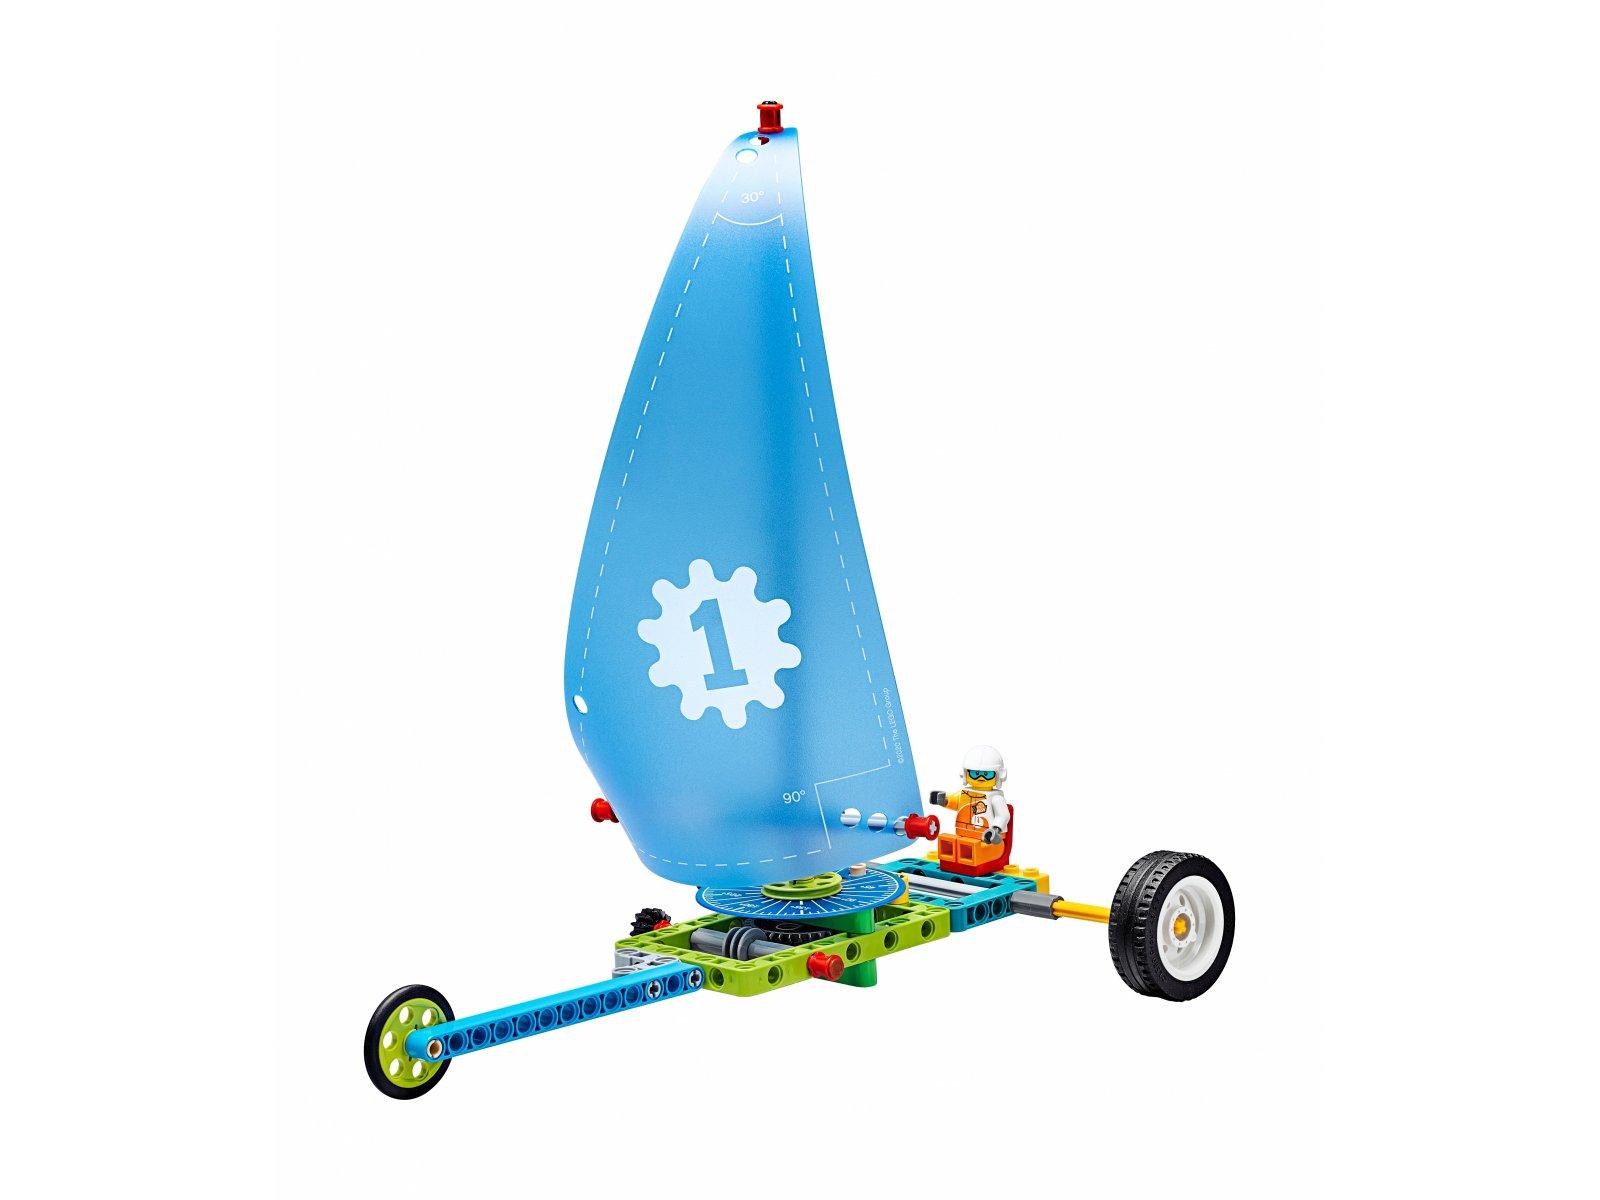 LEGO 45400 Education BricQ Motion Prime